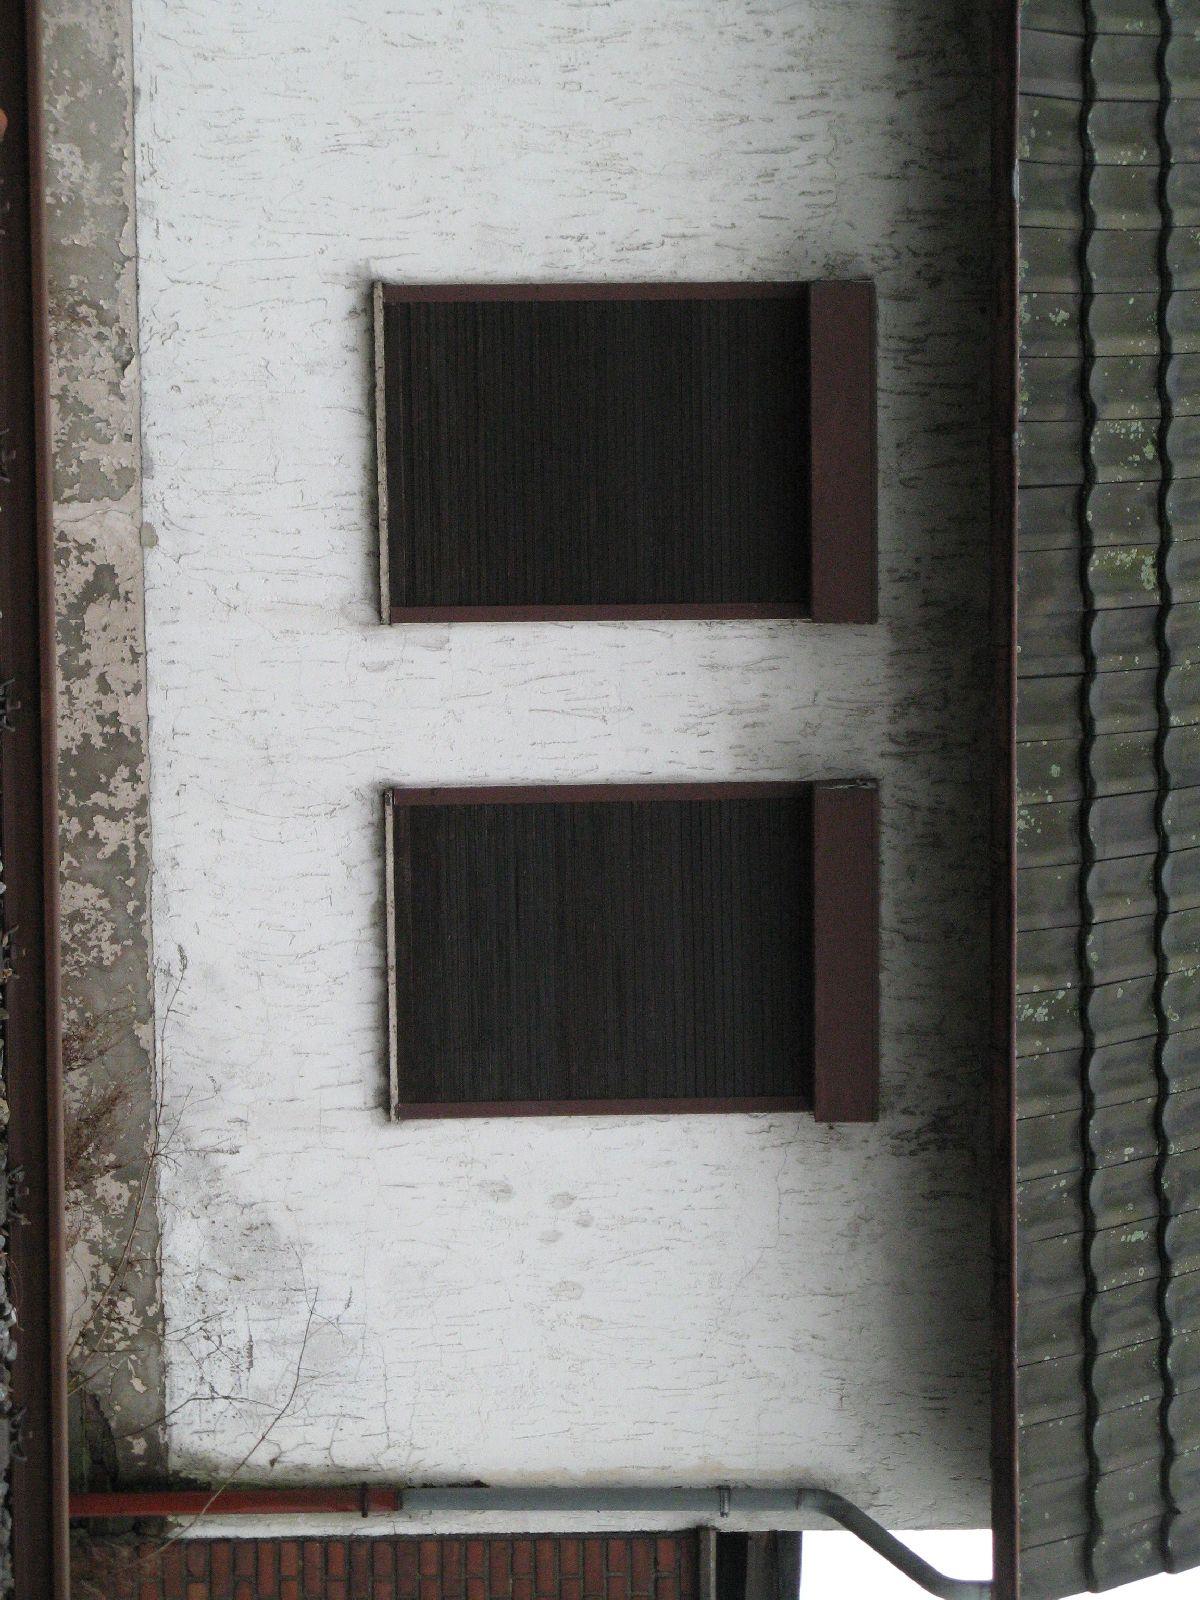 Building_Texture_B_3997